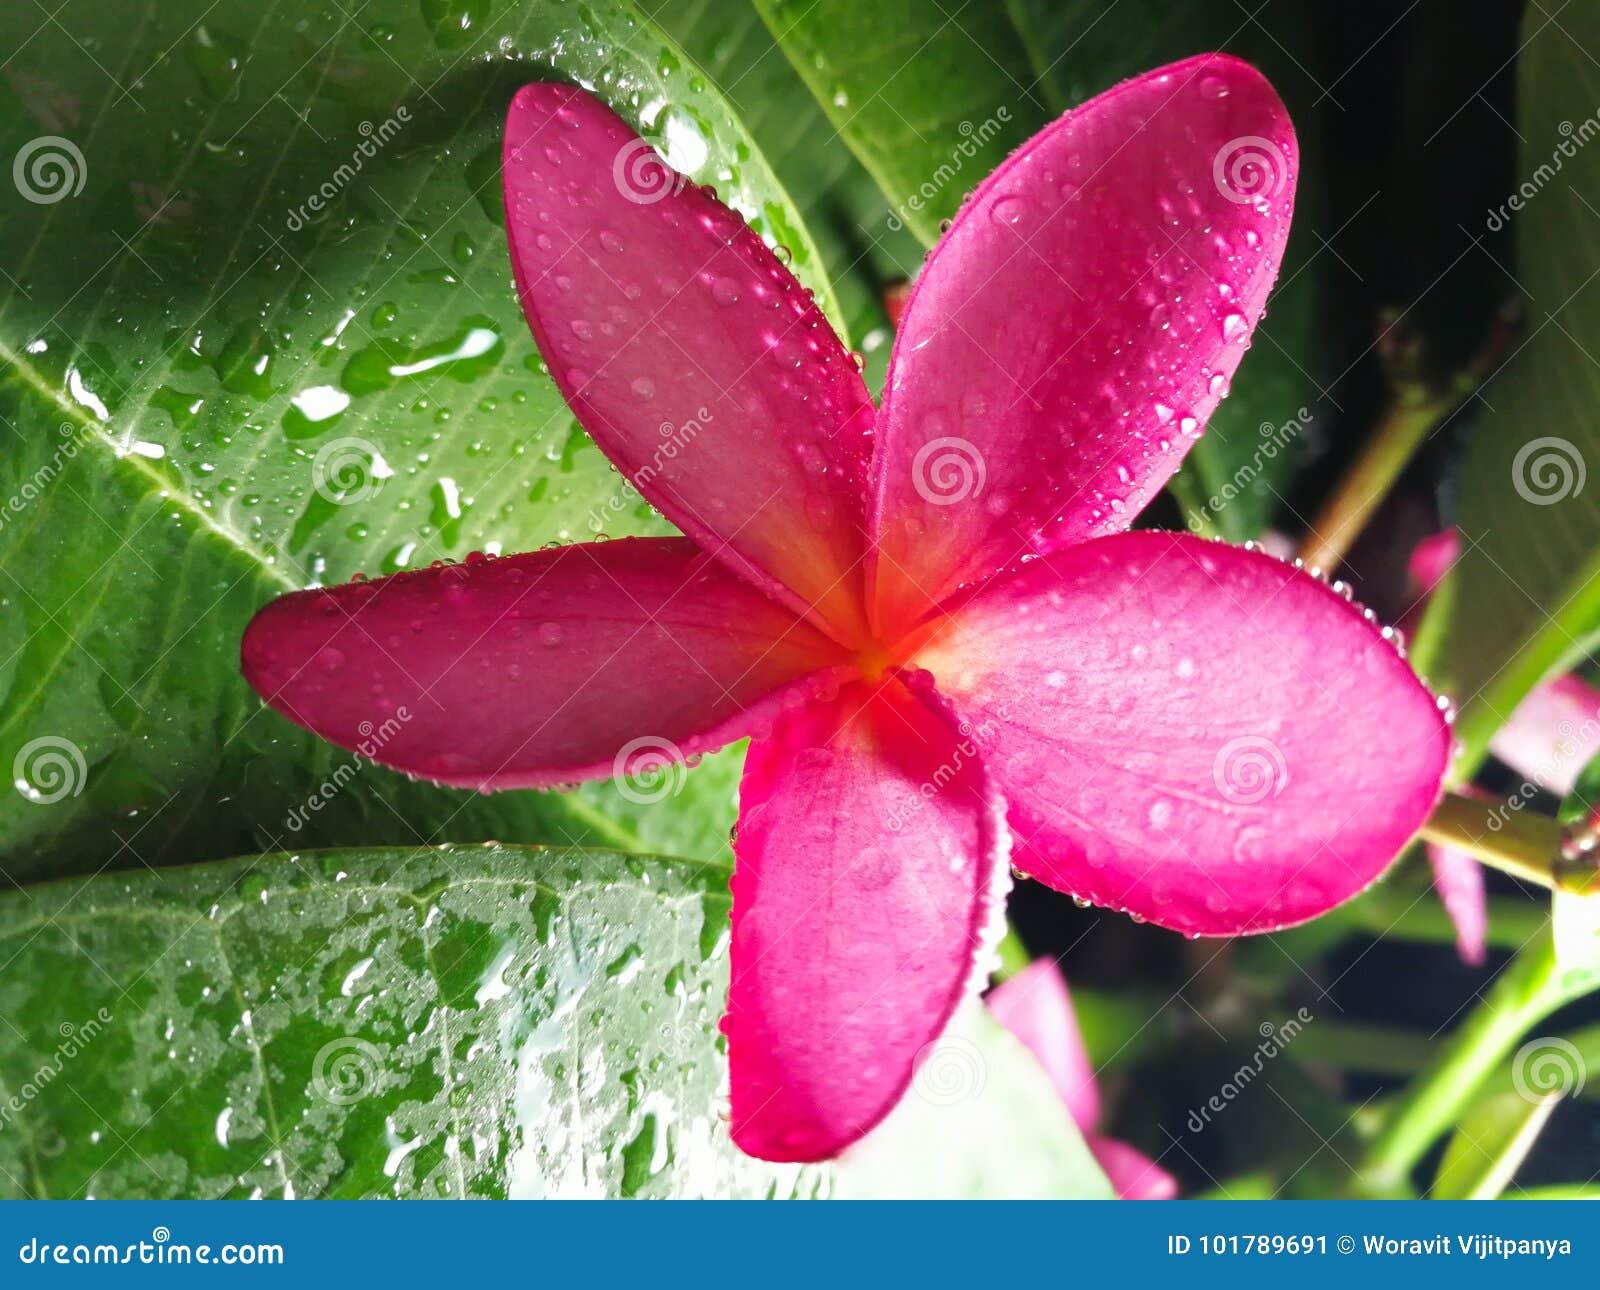 Pink plumeria flower hawaii stock image image of summer fragile download pink plumeria flower hawaii stock image image of summer fragile 101789691 mightylinksfo